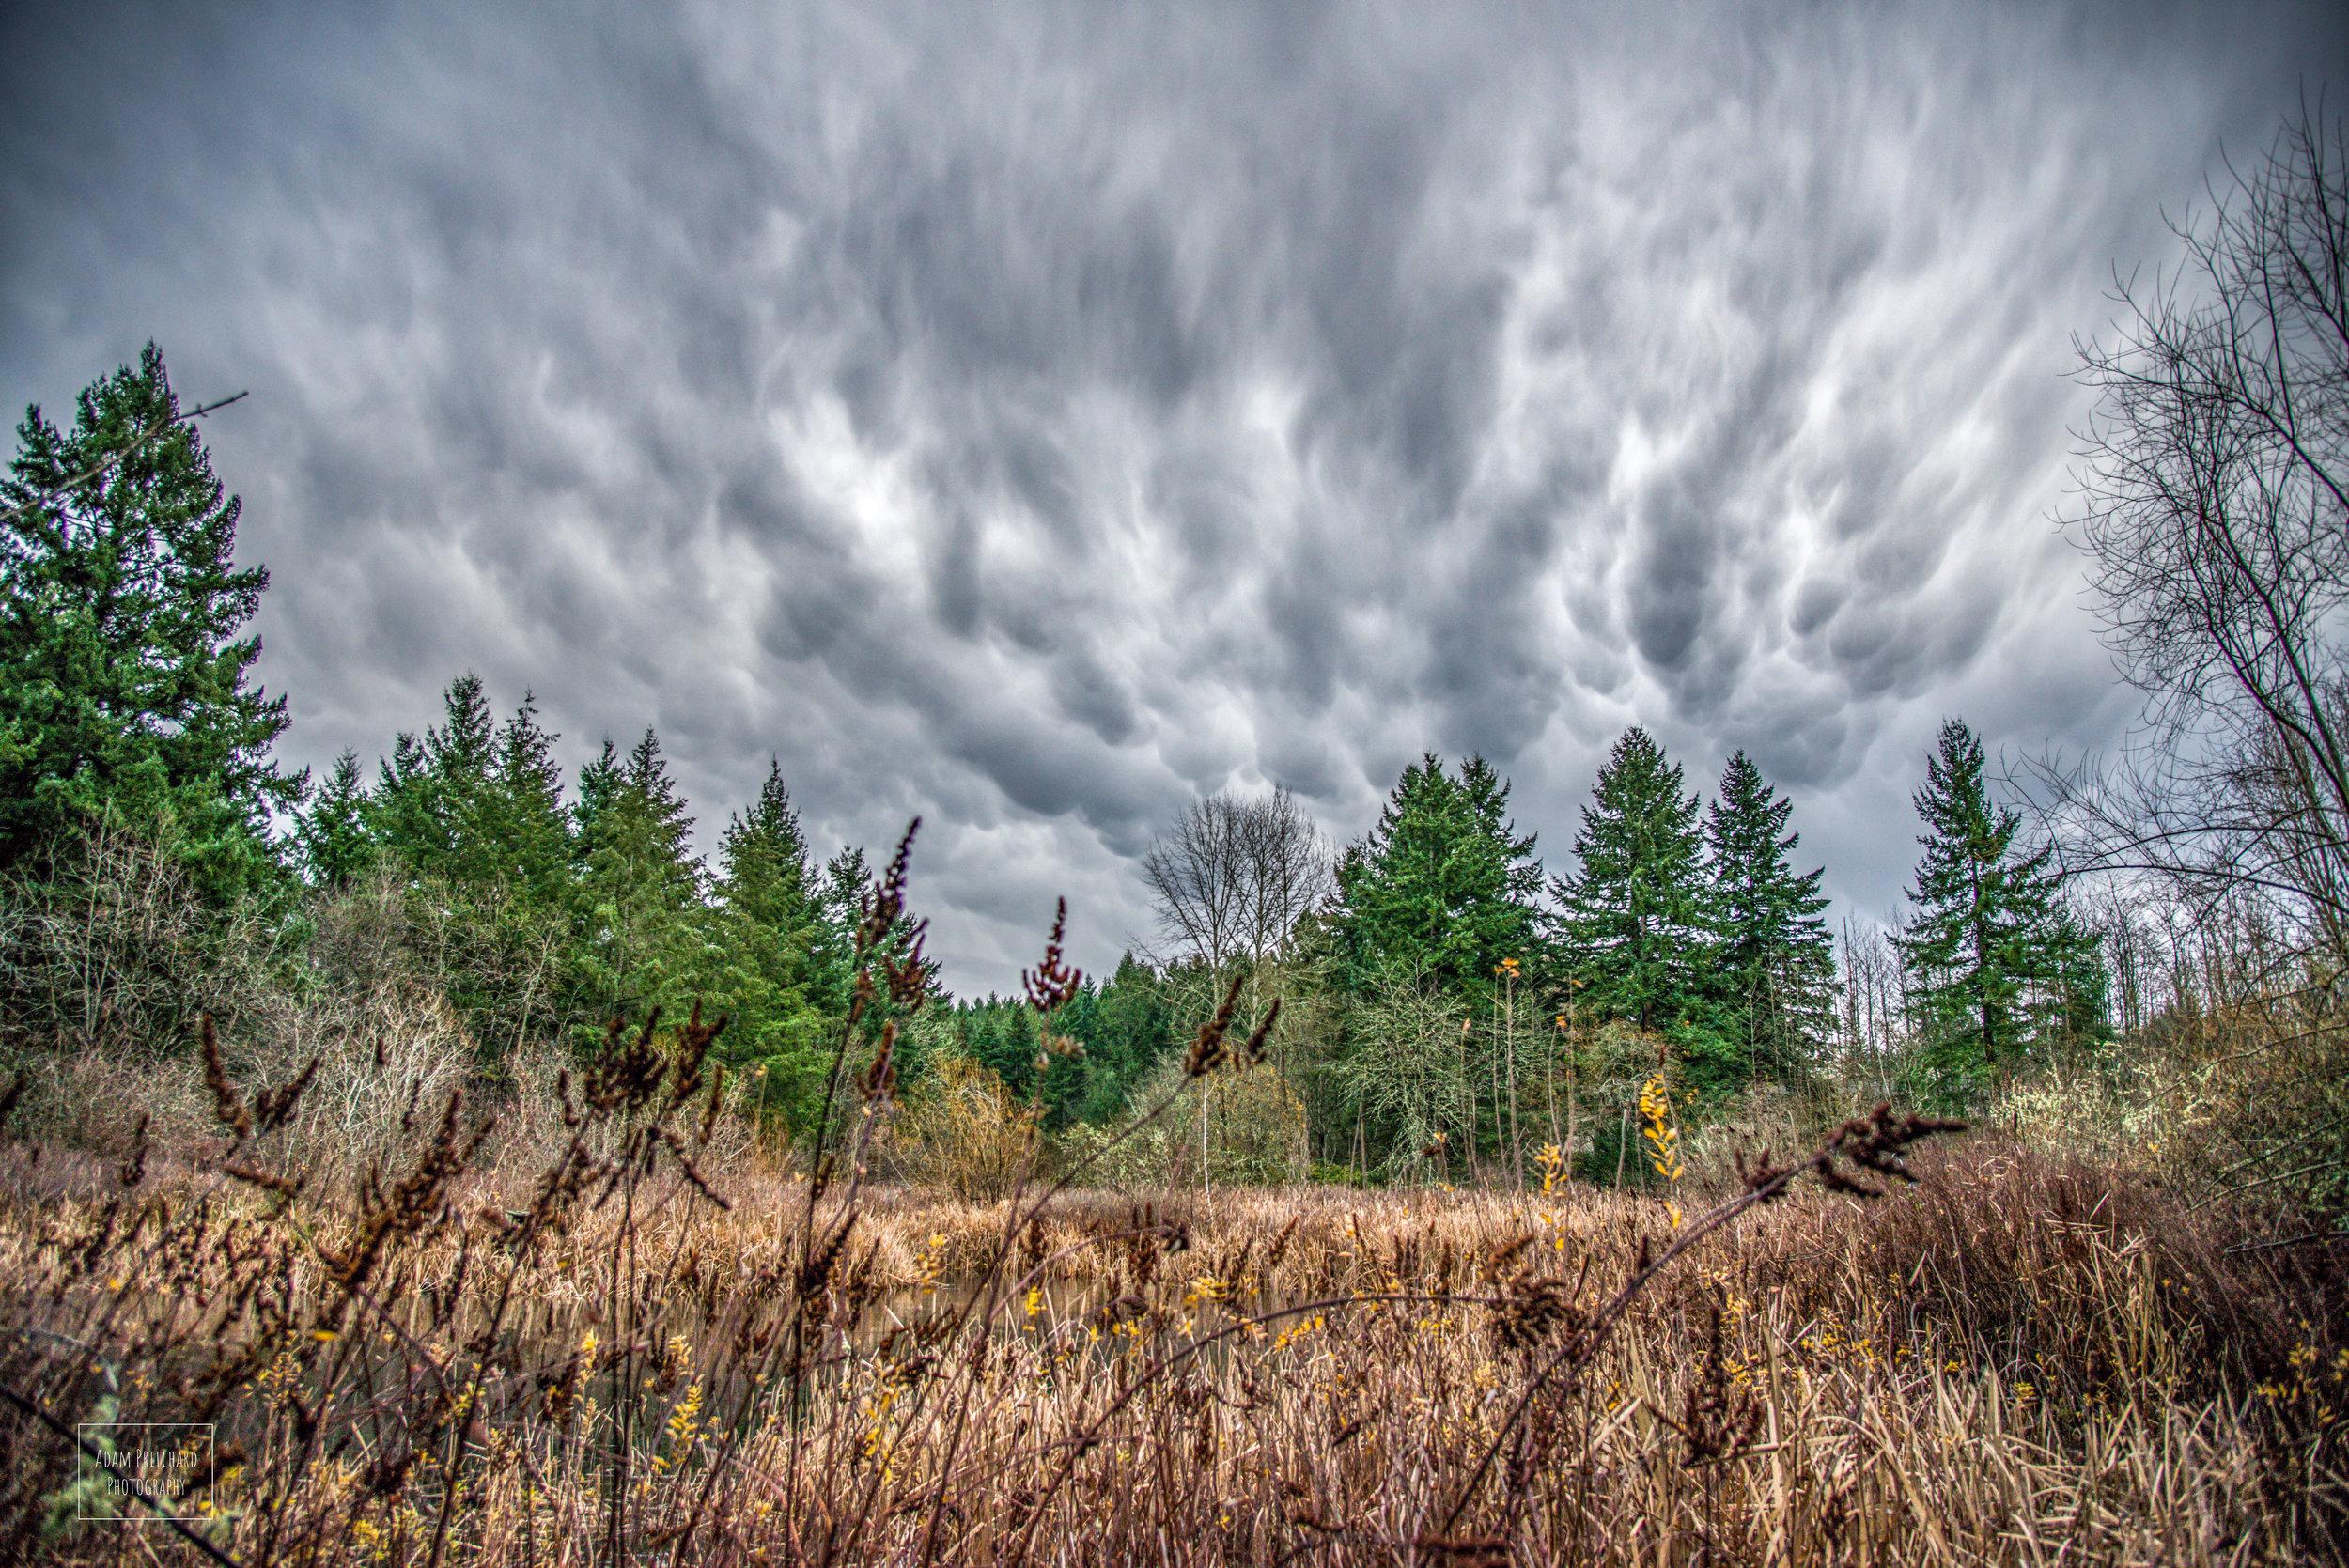 Mammatus clouds over the pond at Adriana Hess Wetland Park. Photo Credit: Adam Pritchard